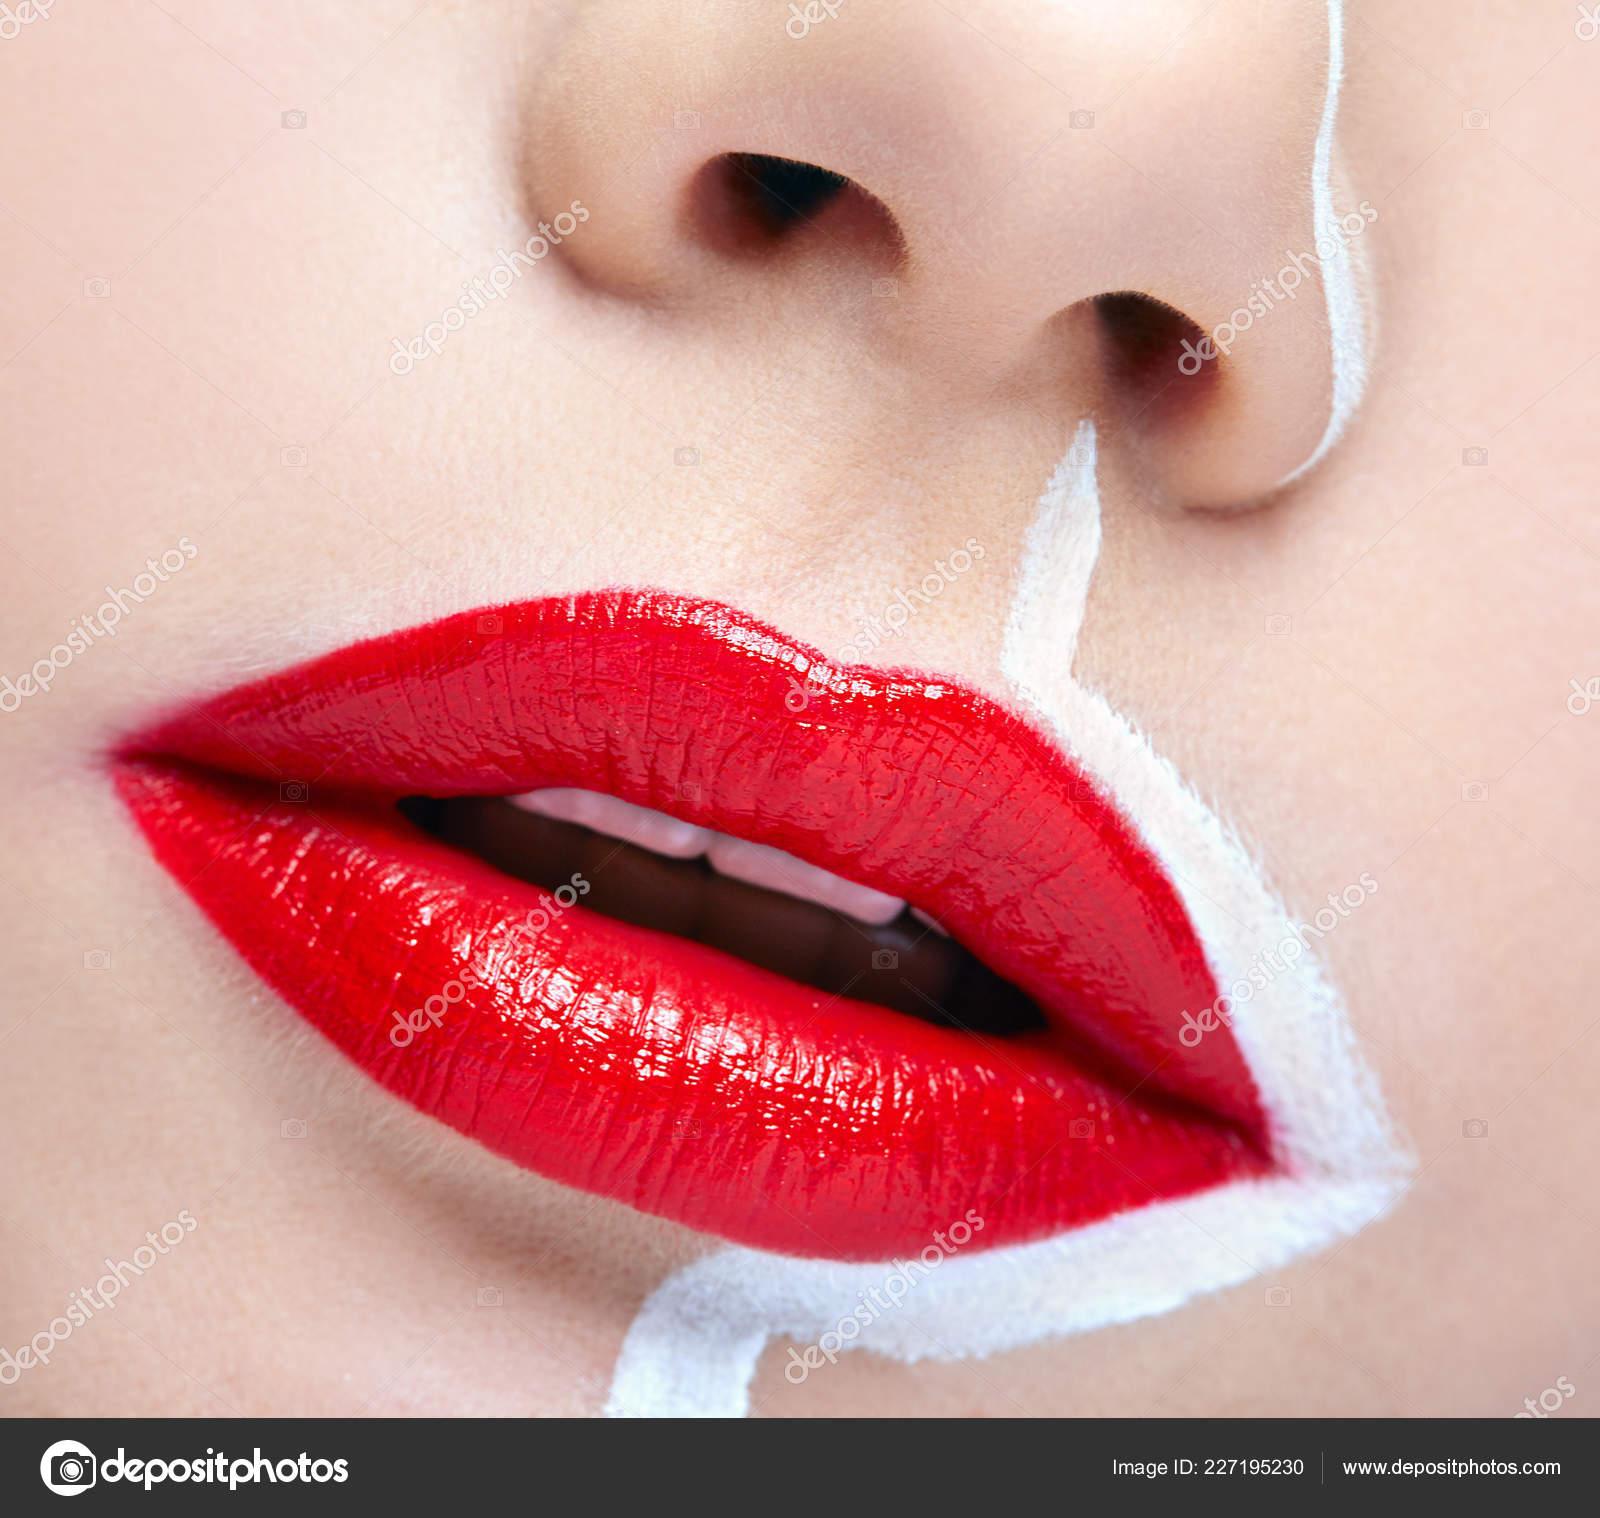 Human Mouth Nose Closeup Macro Portrait Female Part Face Painting Stock Photo C Zastavkin 227195230